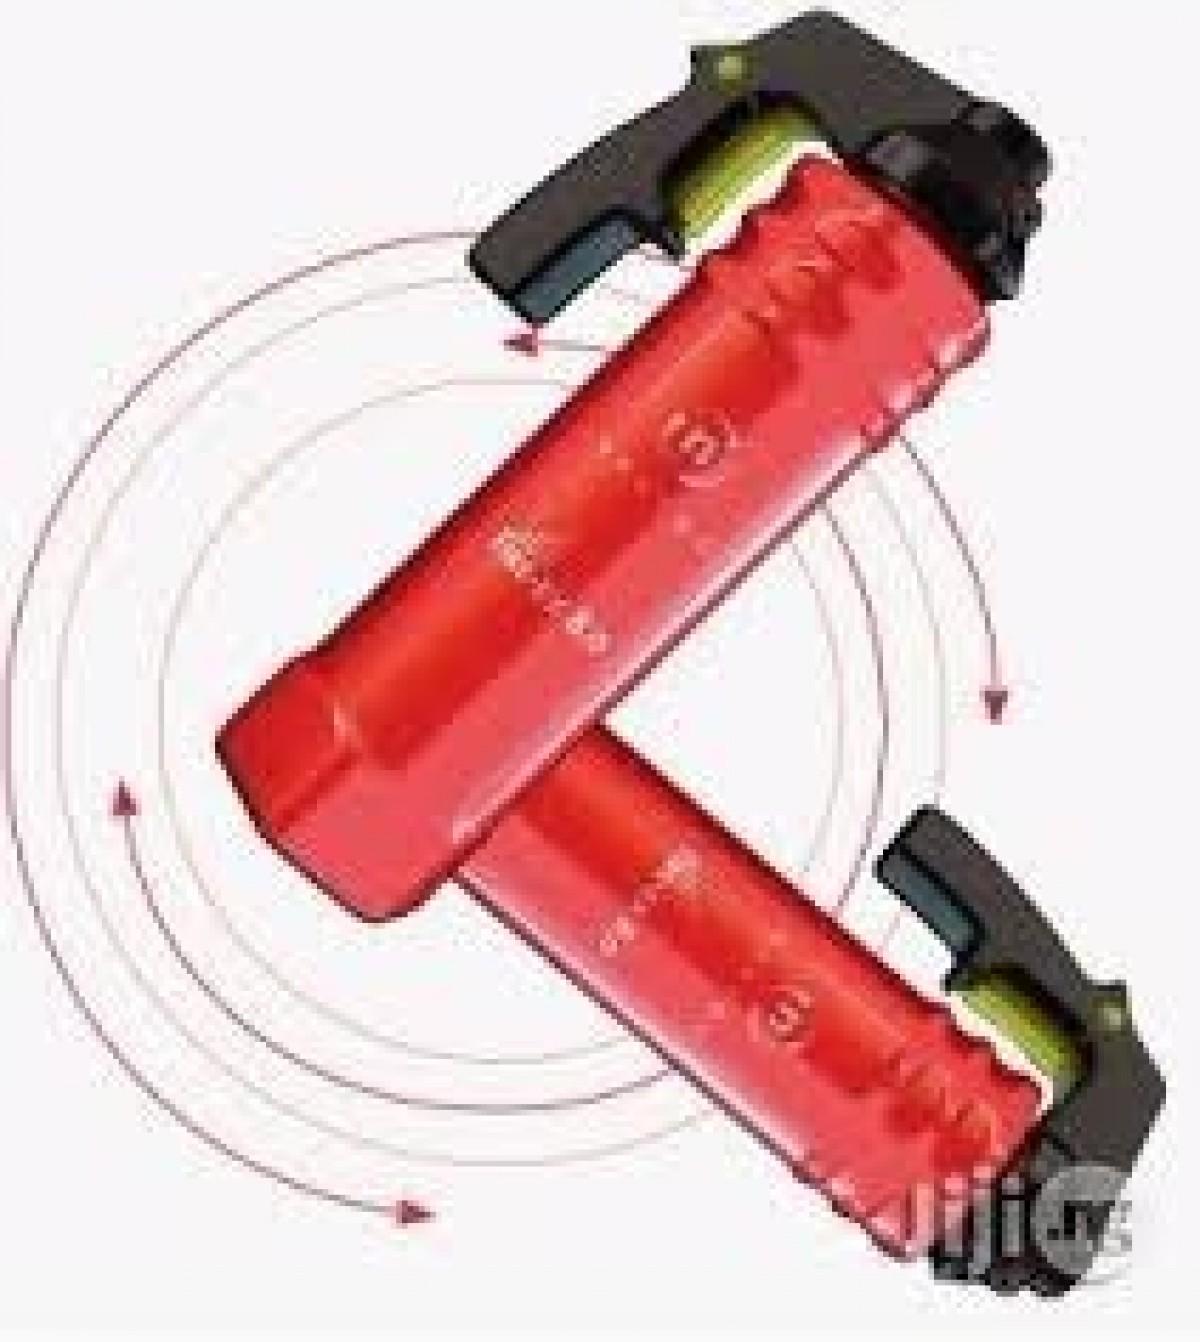 F-EXX Fire Extinguisher image